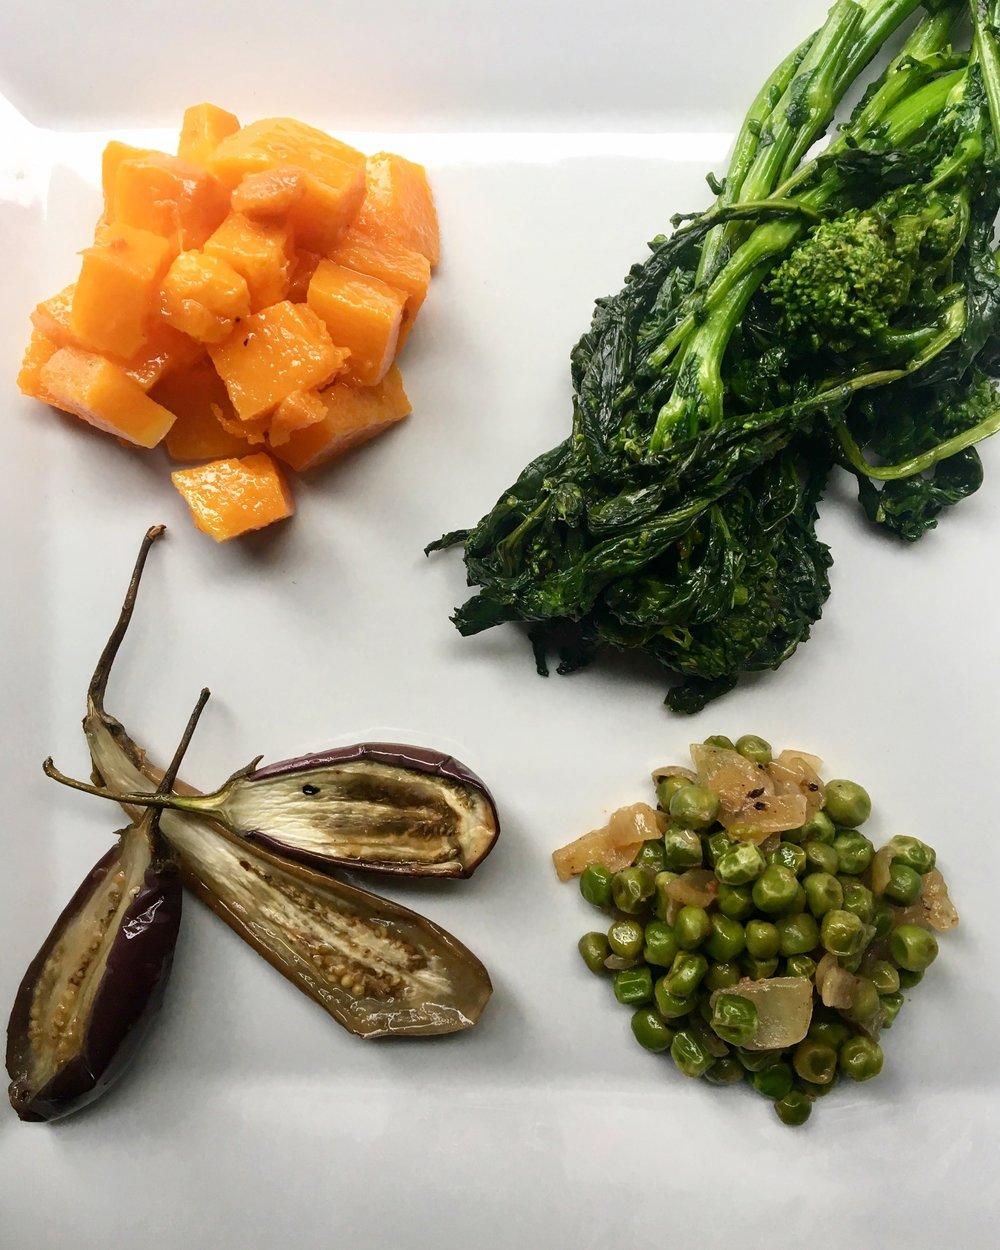 Vegetable Building Blocks: Pharsi Squash / Broccolirabe / Roasted Eggplant / Peas + Onions